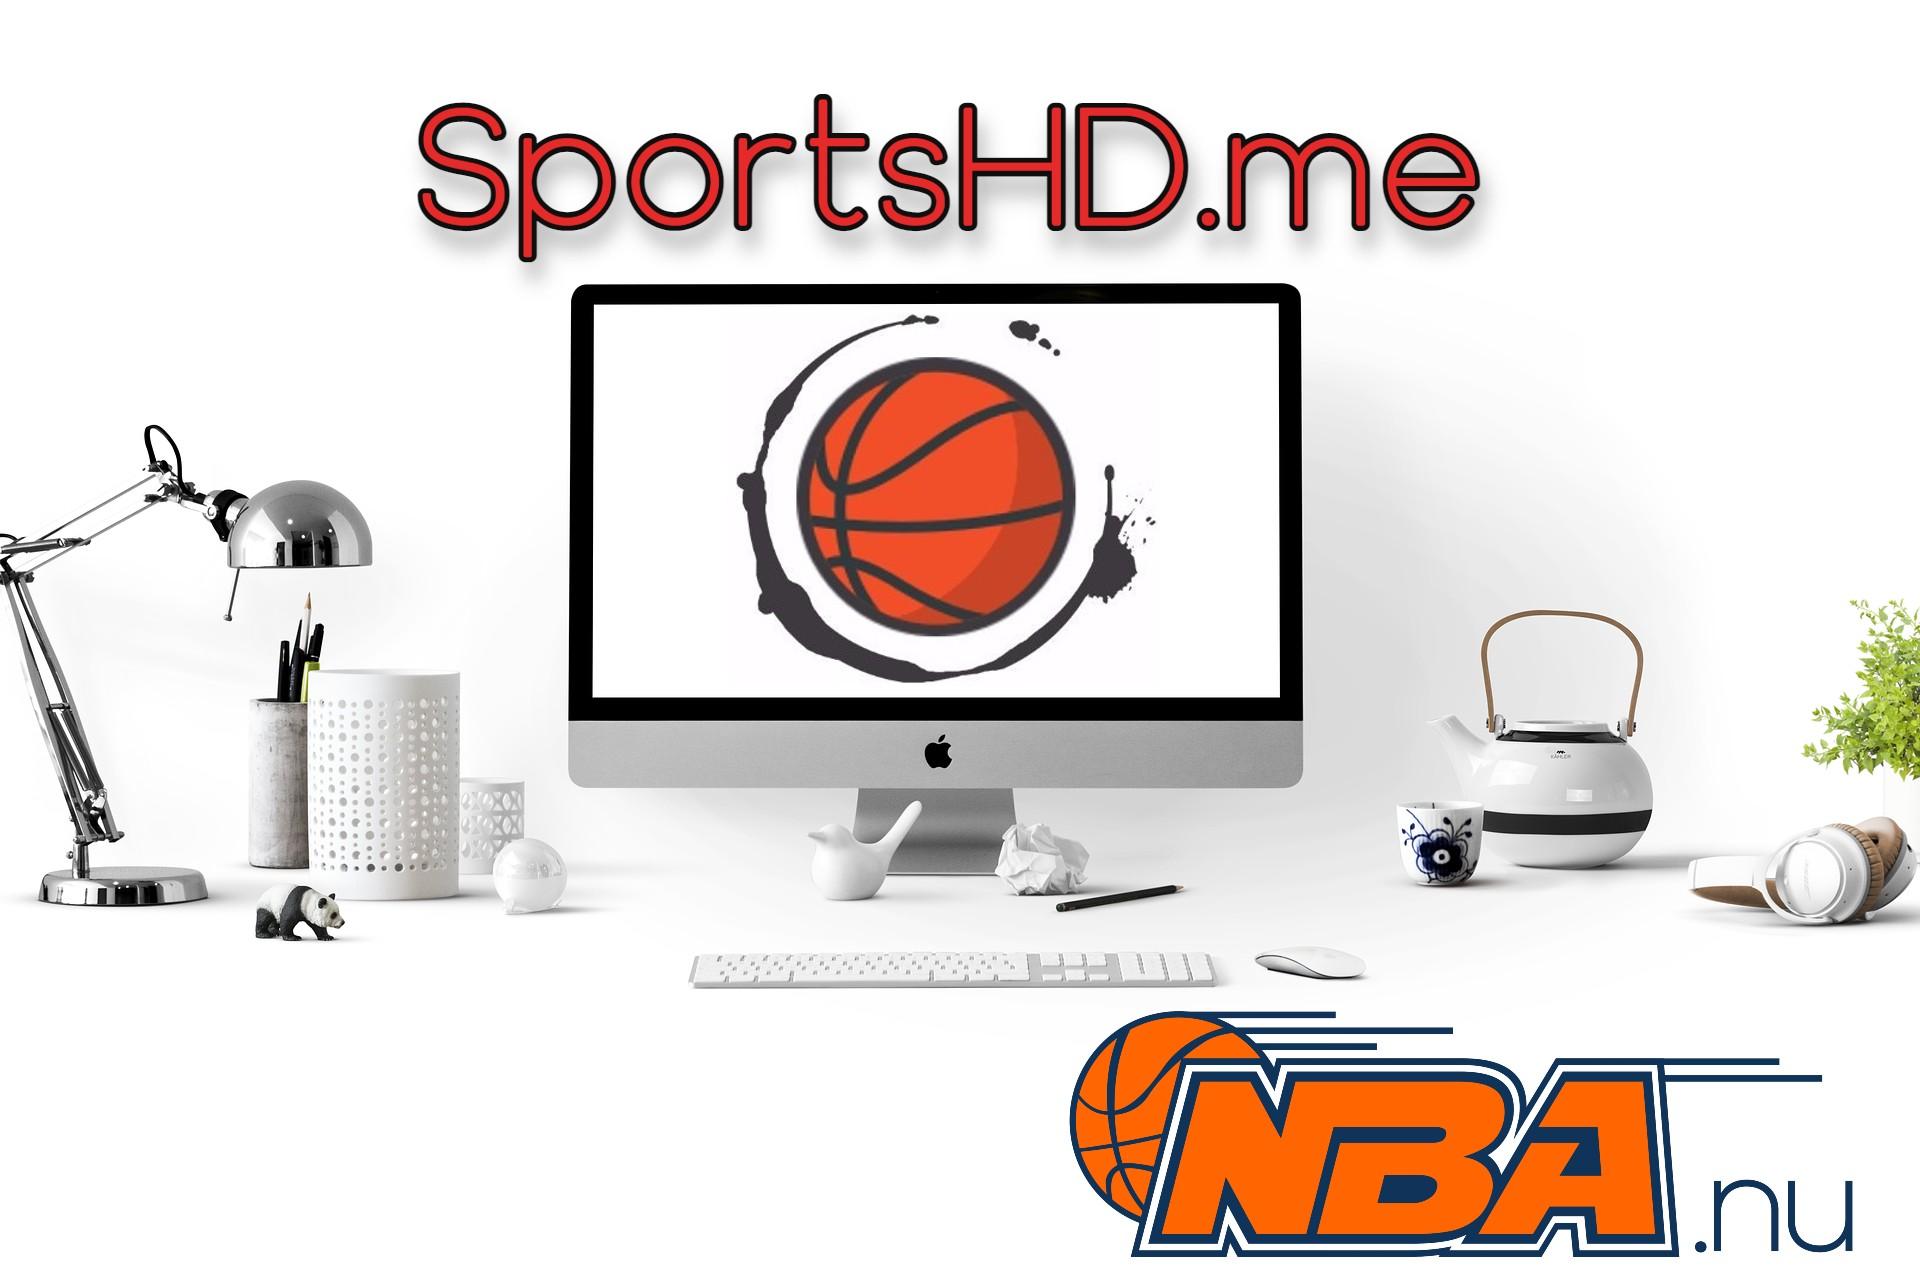 SportsHD.me nba